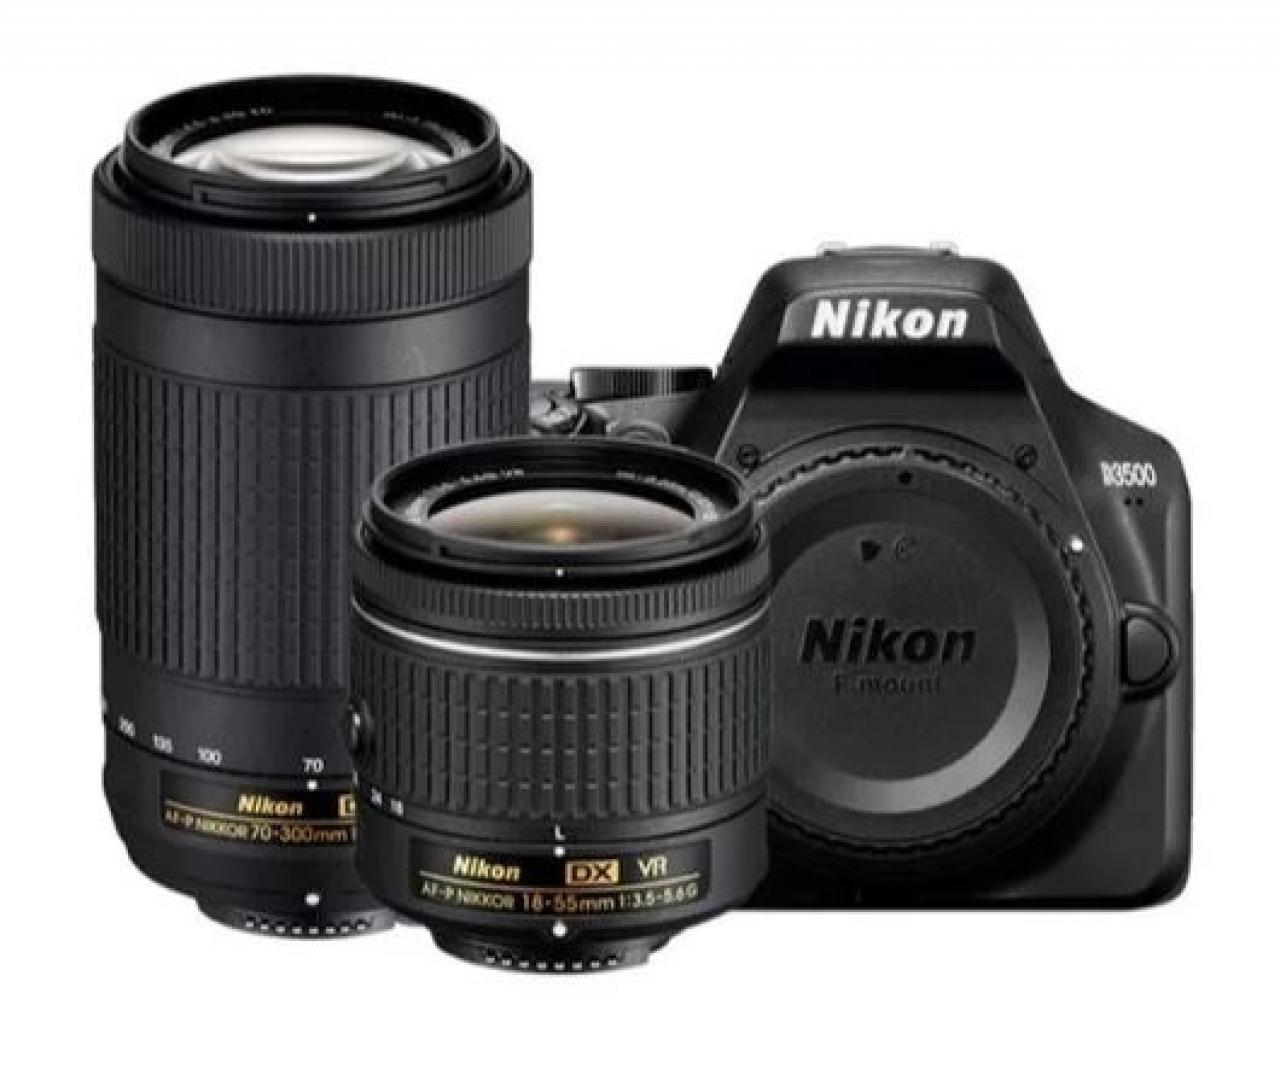 Gb D350018 55 P Af 300 it Nikon Fotocolombo VrSd Su Vr70 16 f6vIYb7yg